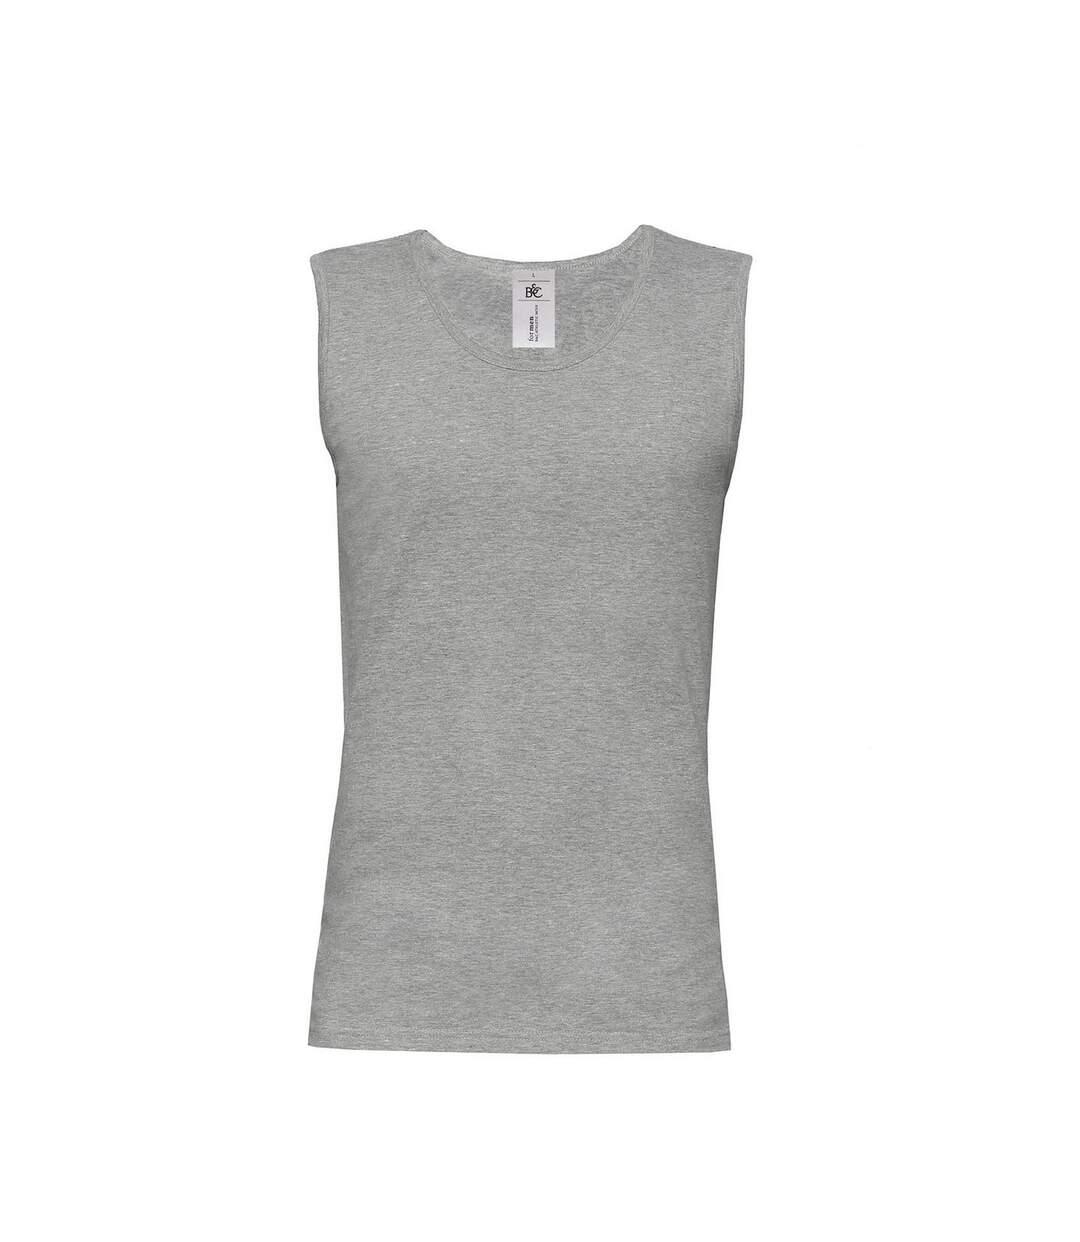 B&C Mens Move Sleeveless Athletic Sports Vest Top (Navy) - UTRW3499